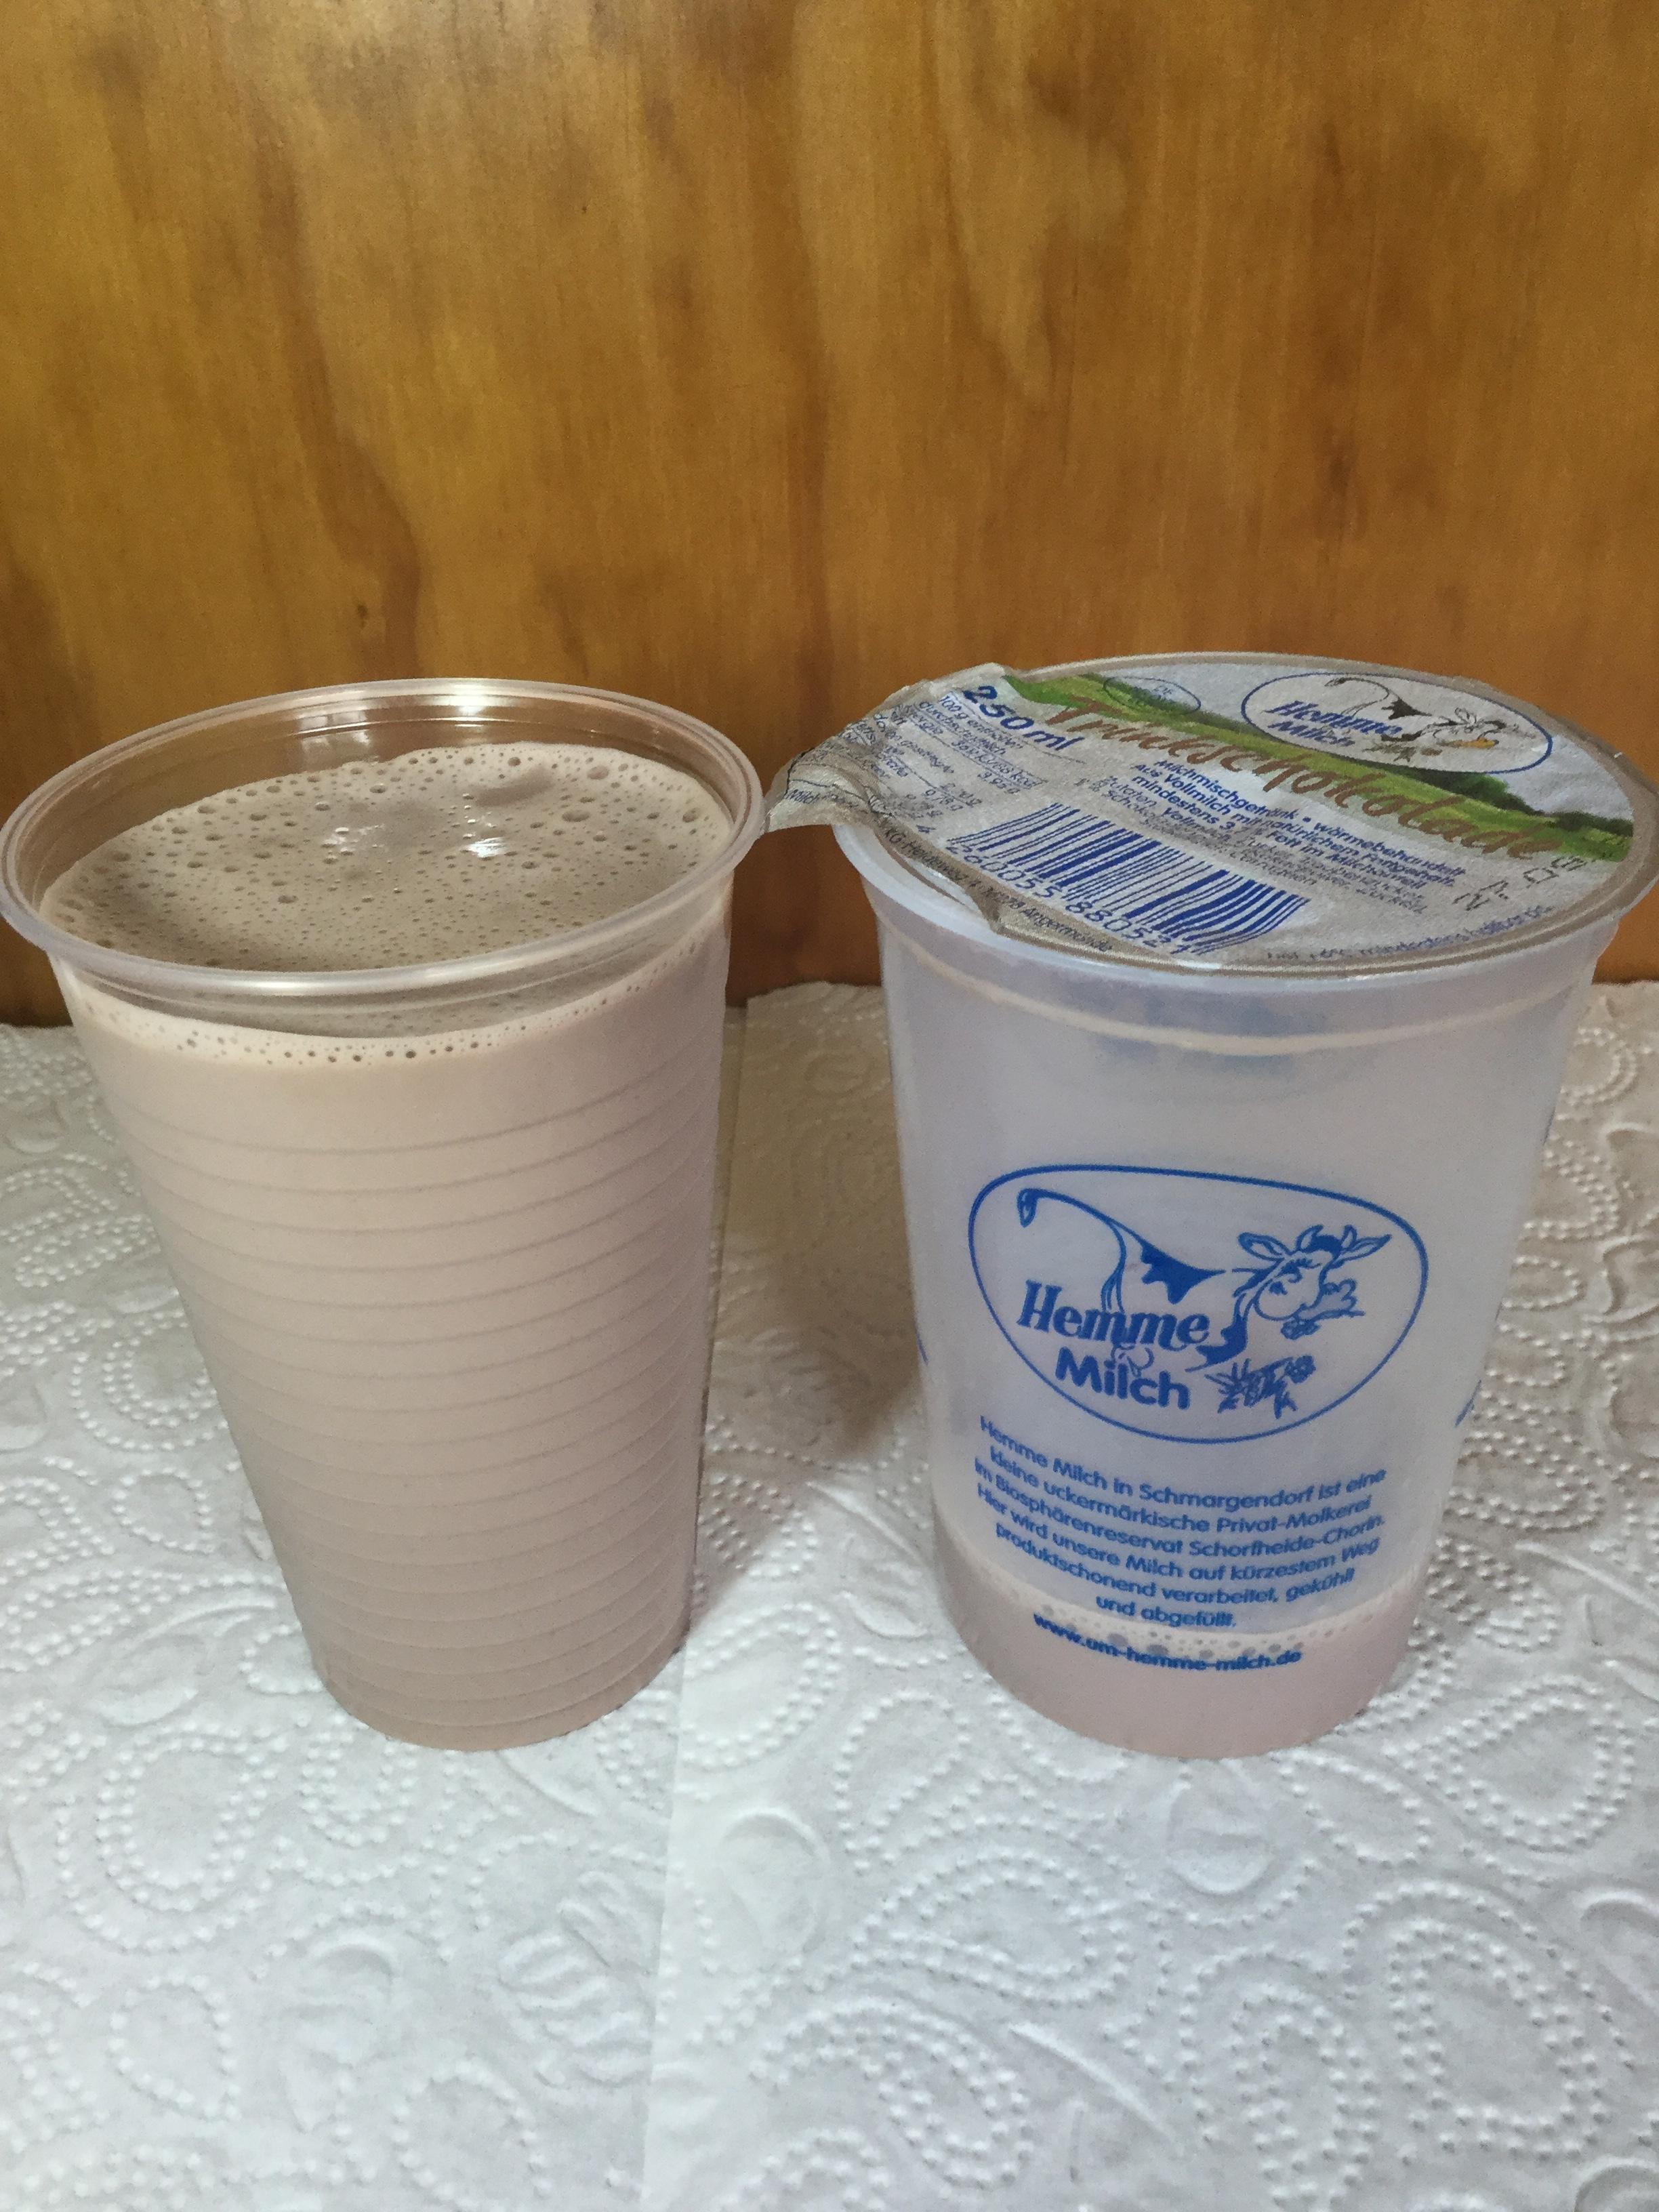 Hemme Milch Trinkschokolade Cup